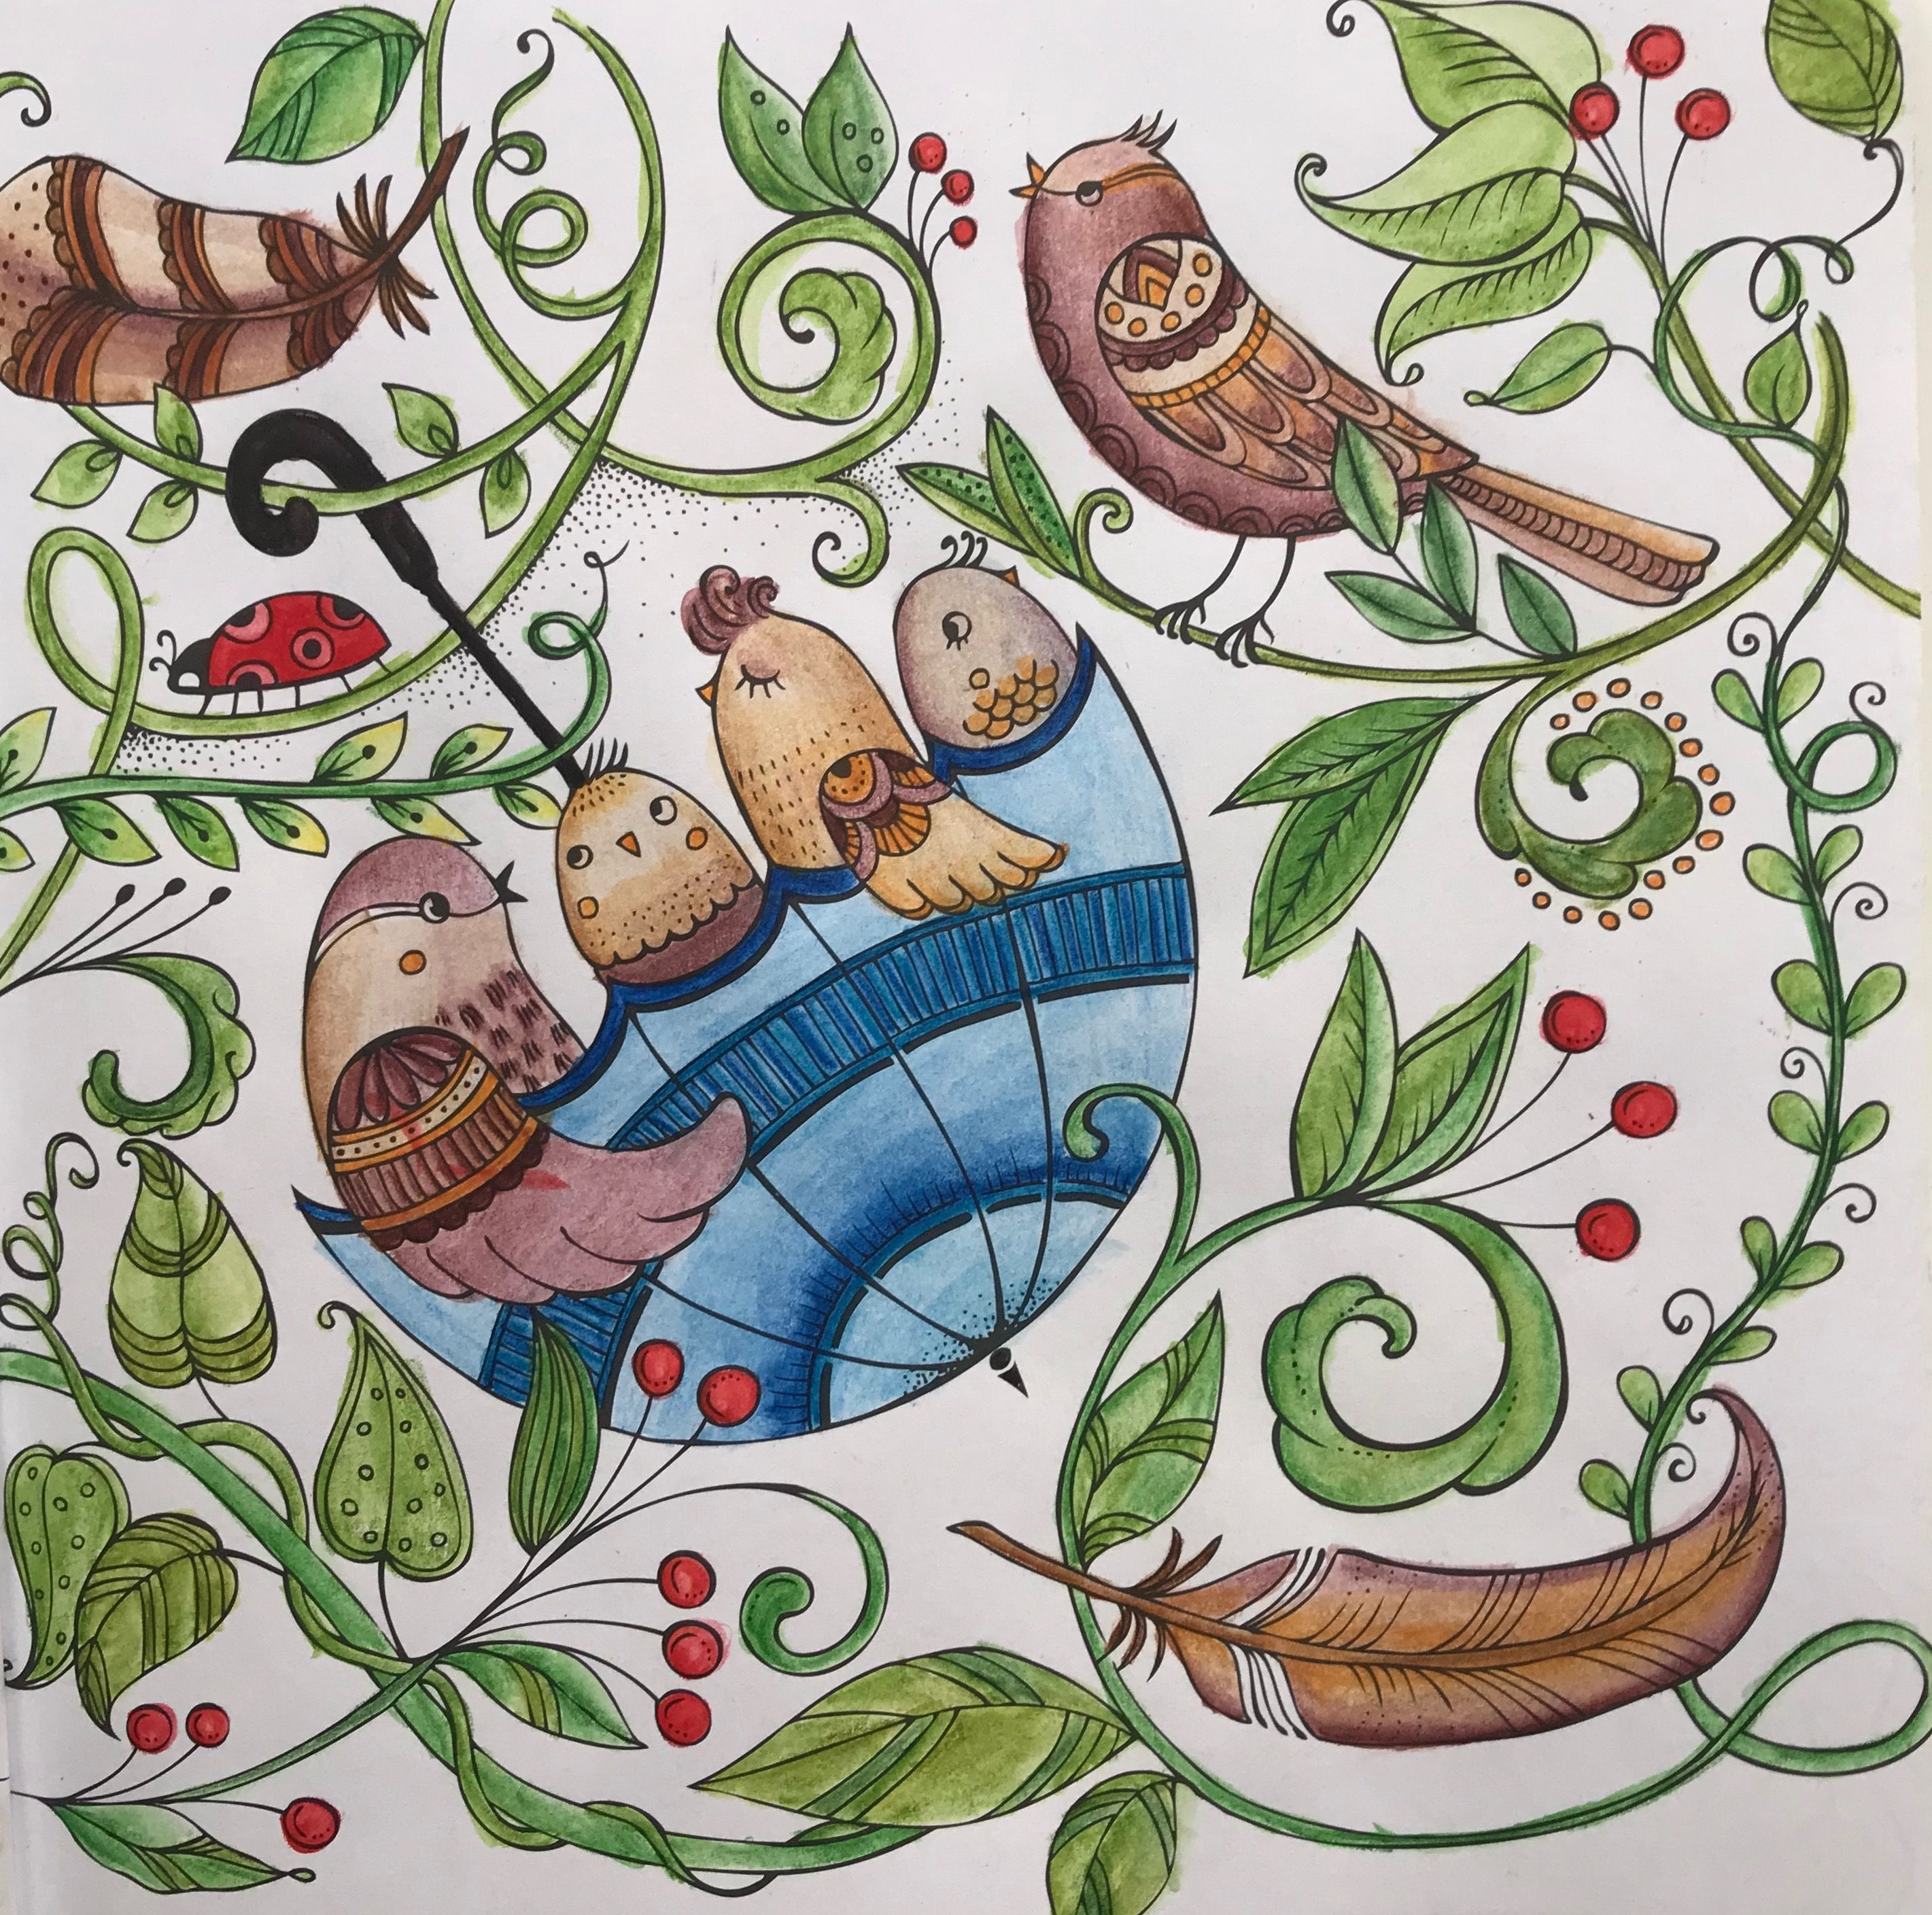 Coloring Kolorowanka Art Coloringart Kredki Coloredpencils Coloringmasterpiece Coloredpencil Meinsommer Coloring Books Watercolor Art Colored Pencils